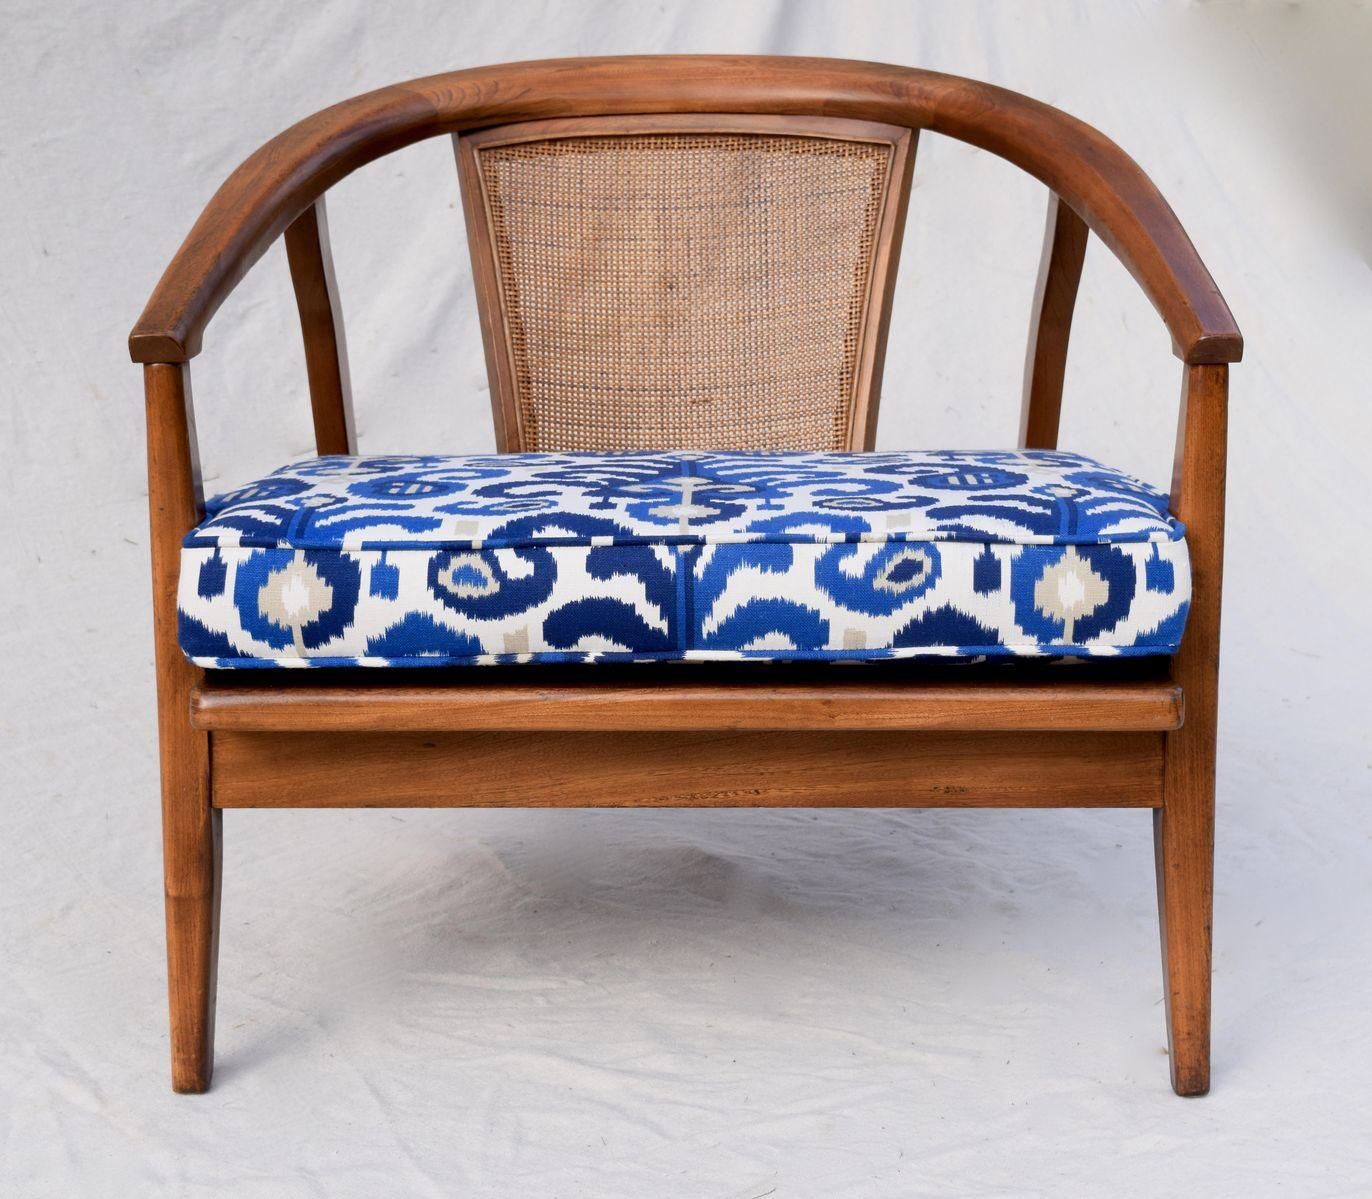 Etonnant 1950s Danish Modern Style Cane Back Barrel Chair On Chairish.com